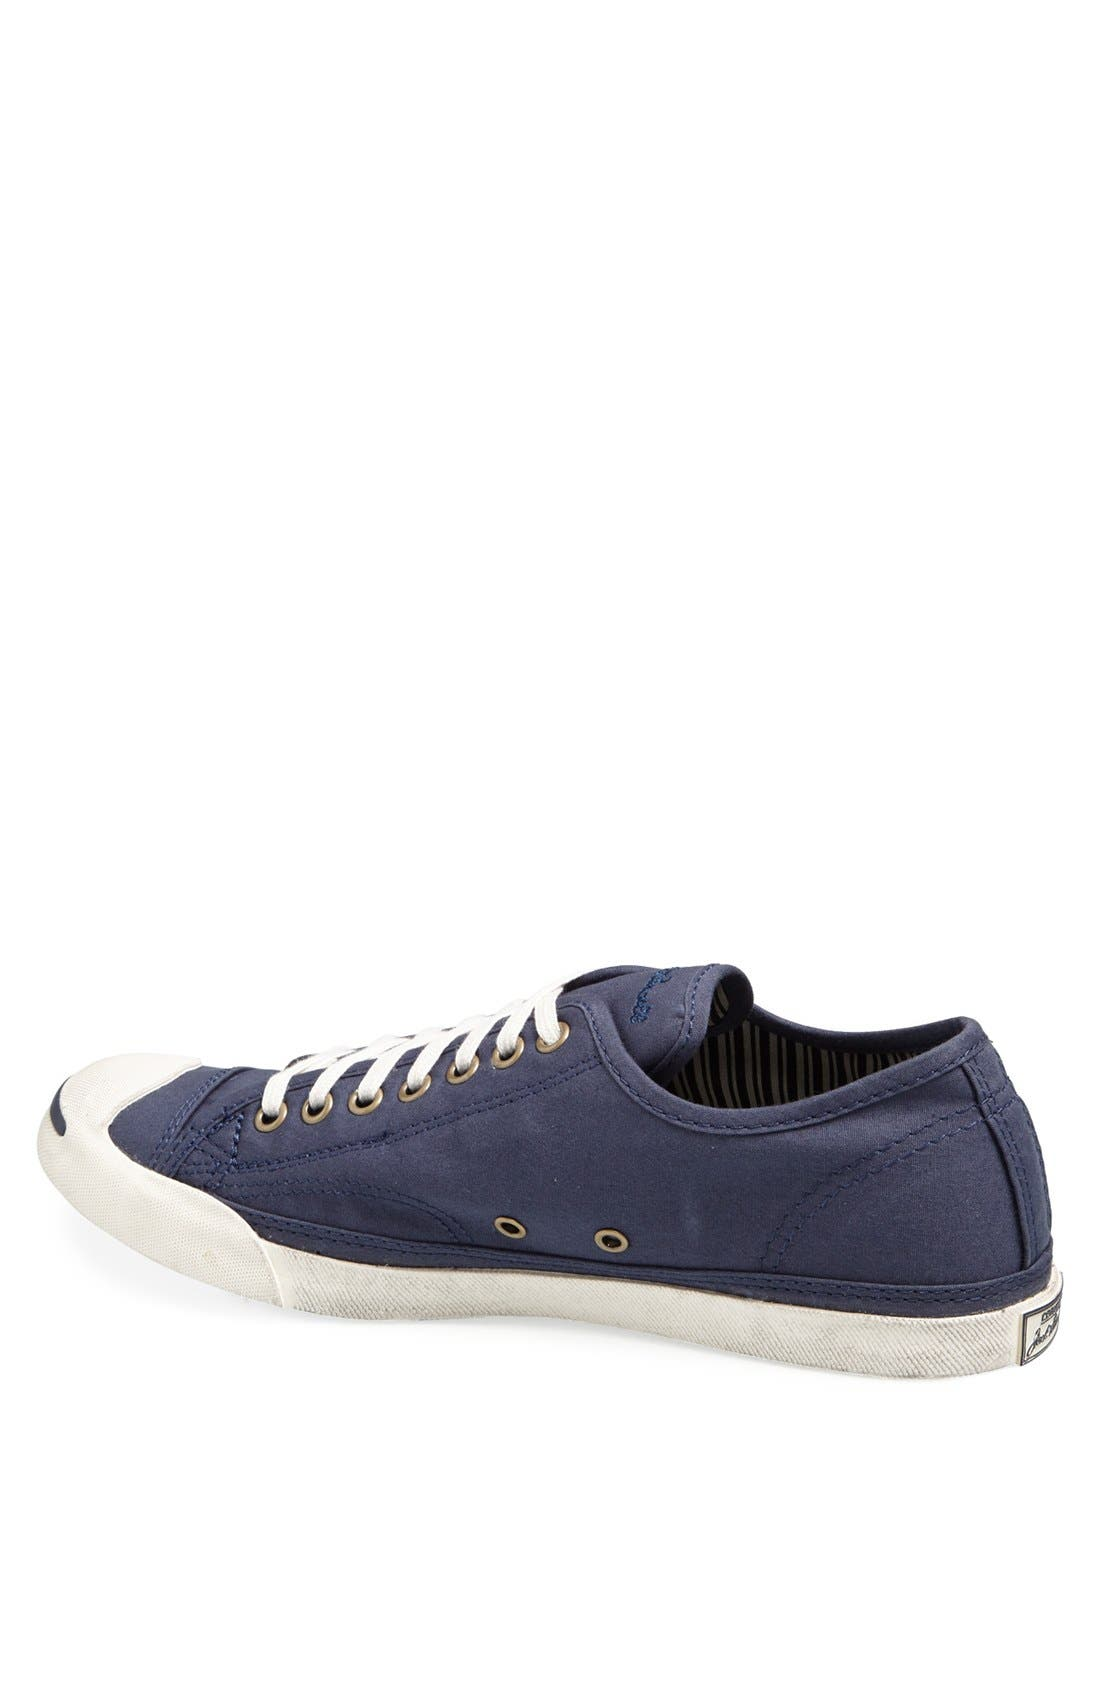 Alternate Image 2  - Converse 'Jack Purcell - Low' Sneaker (Men)